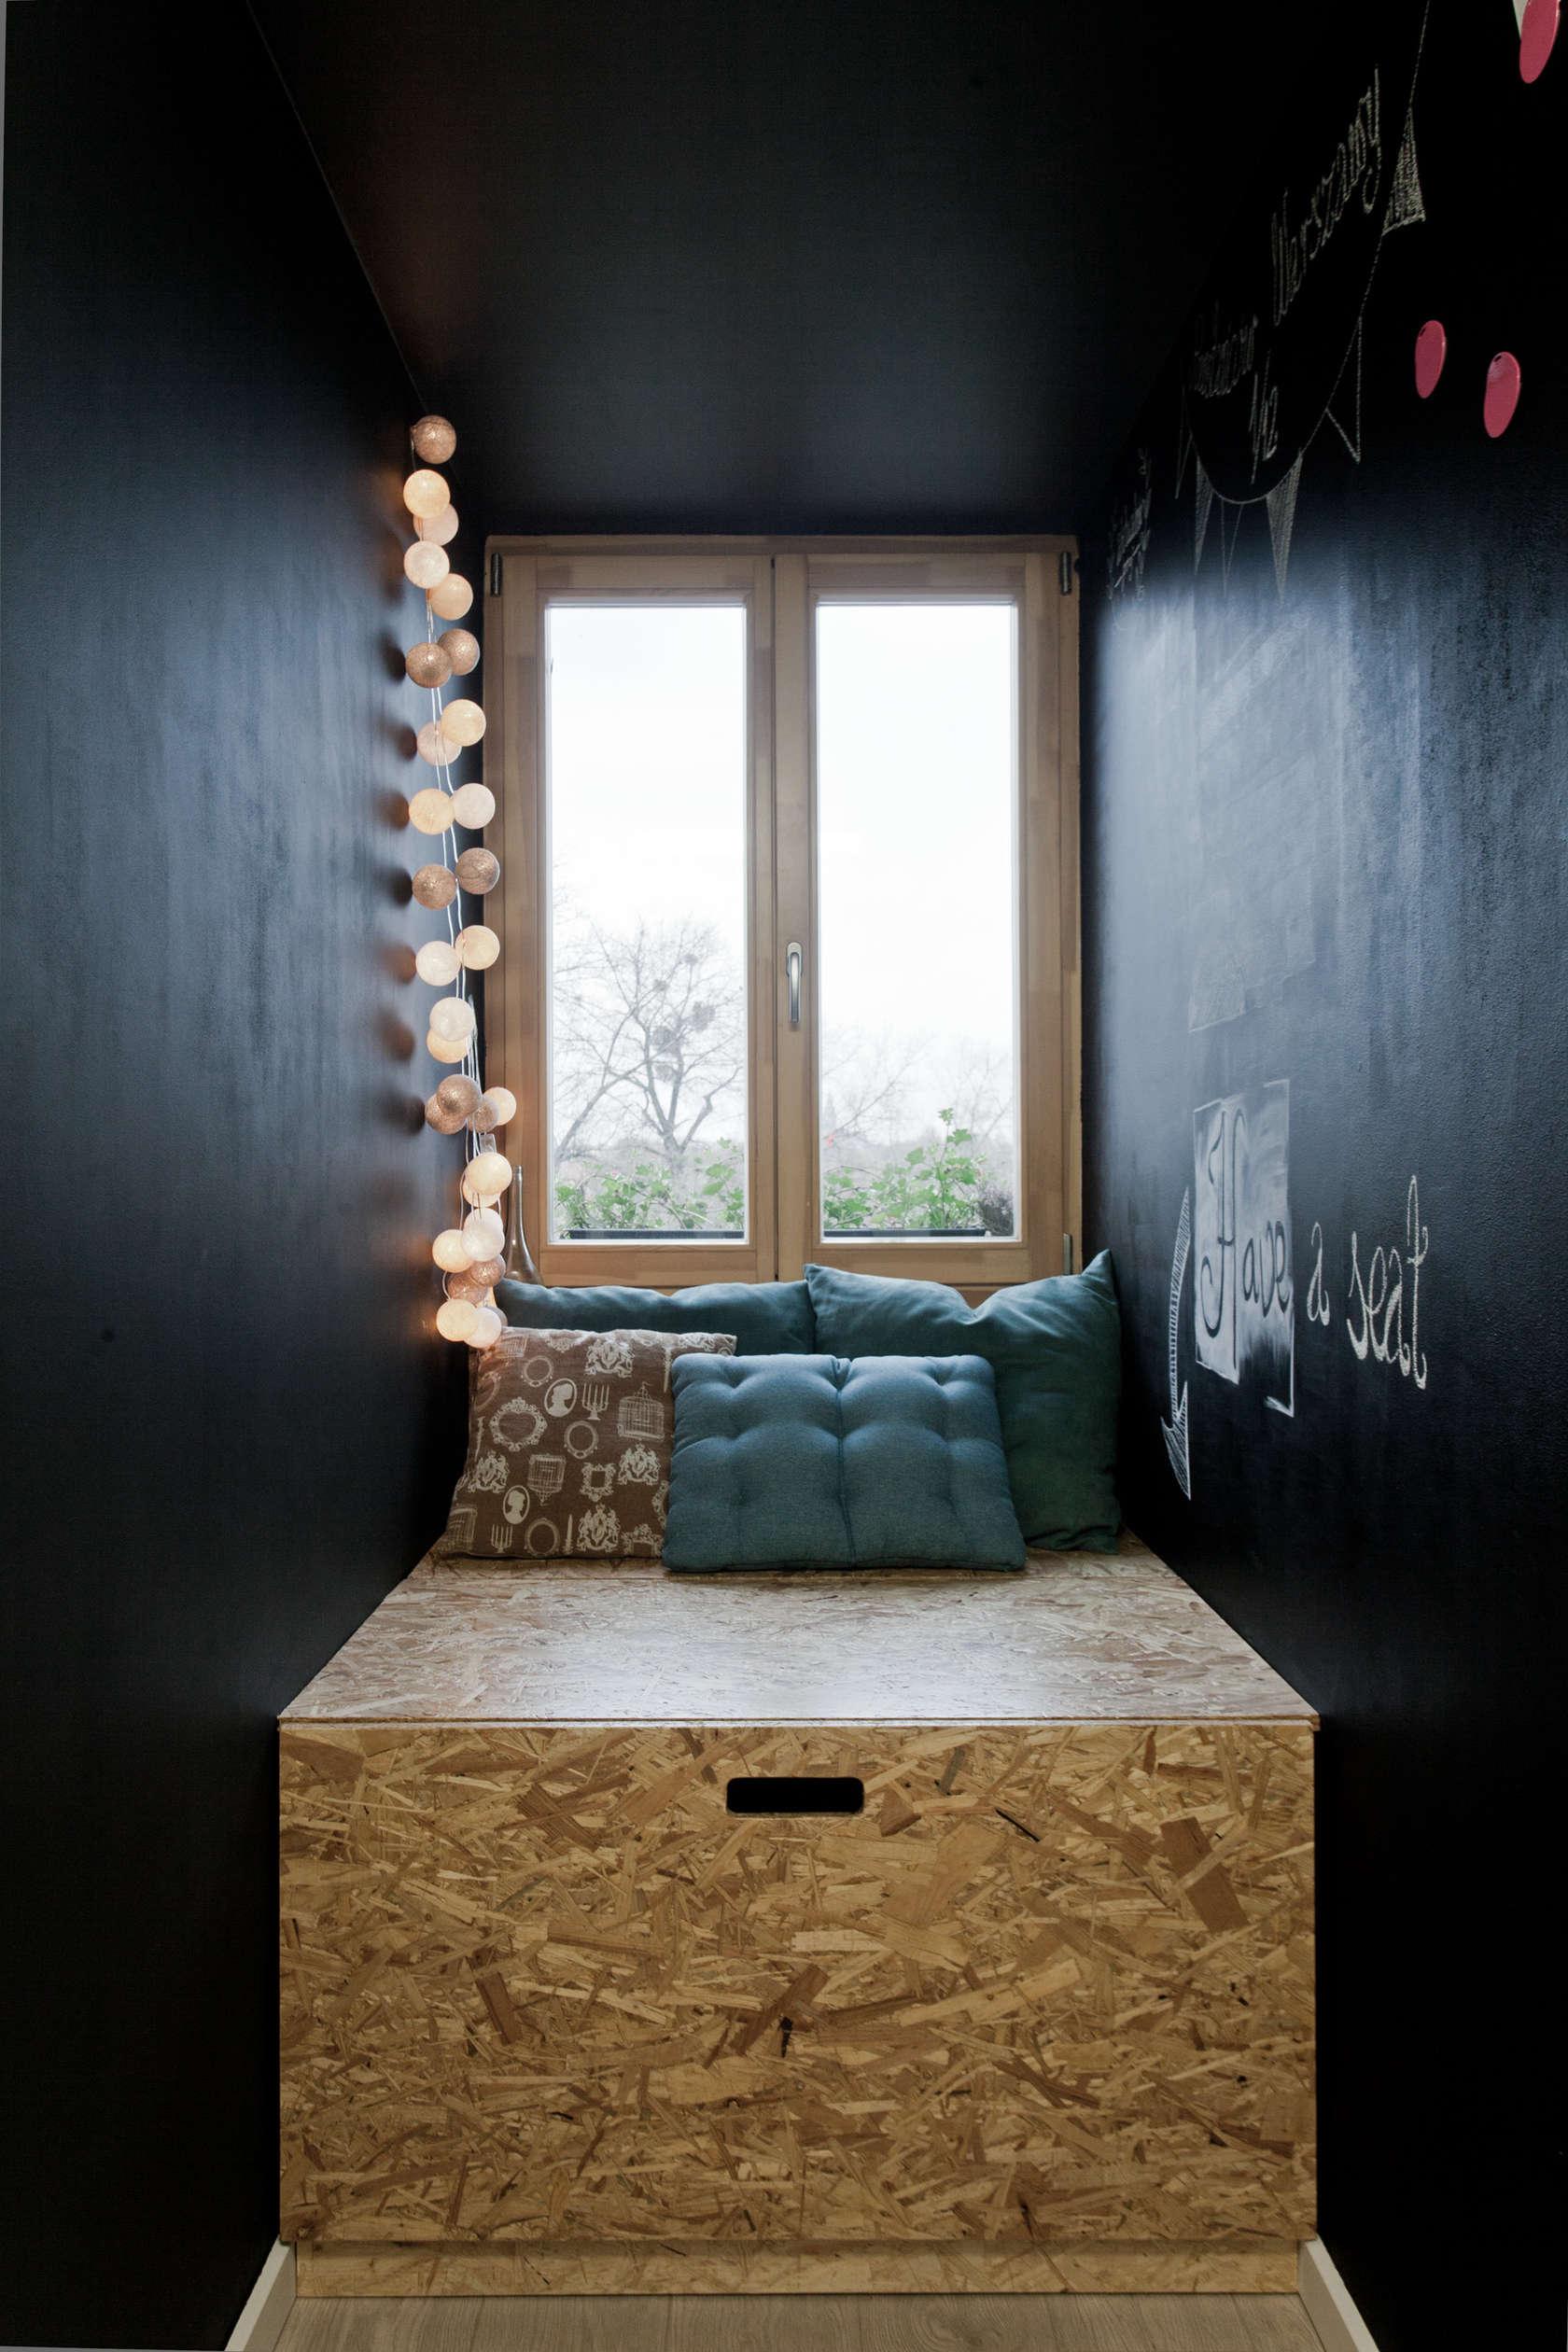 Window set decoration